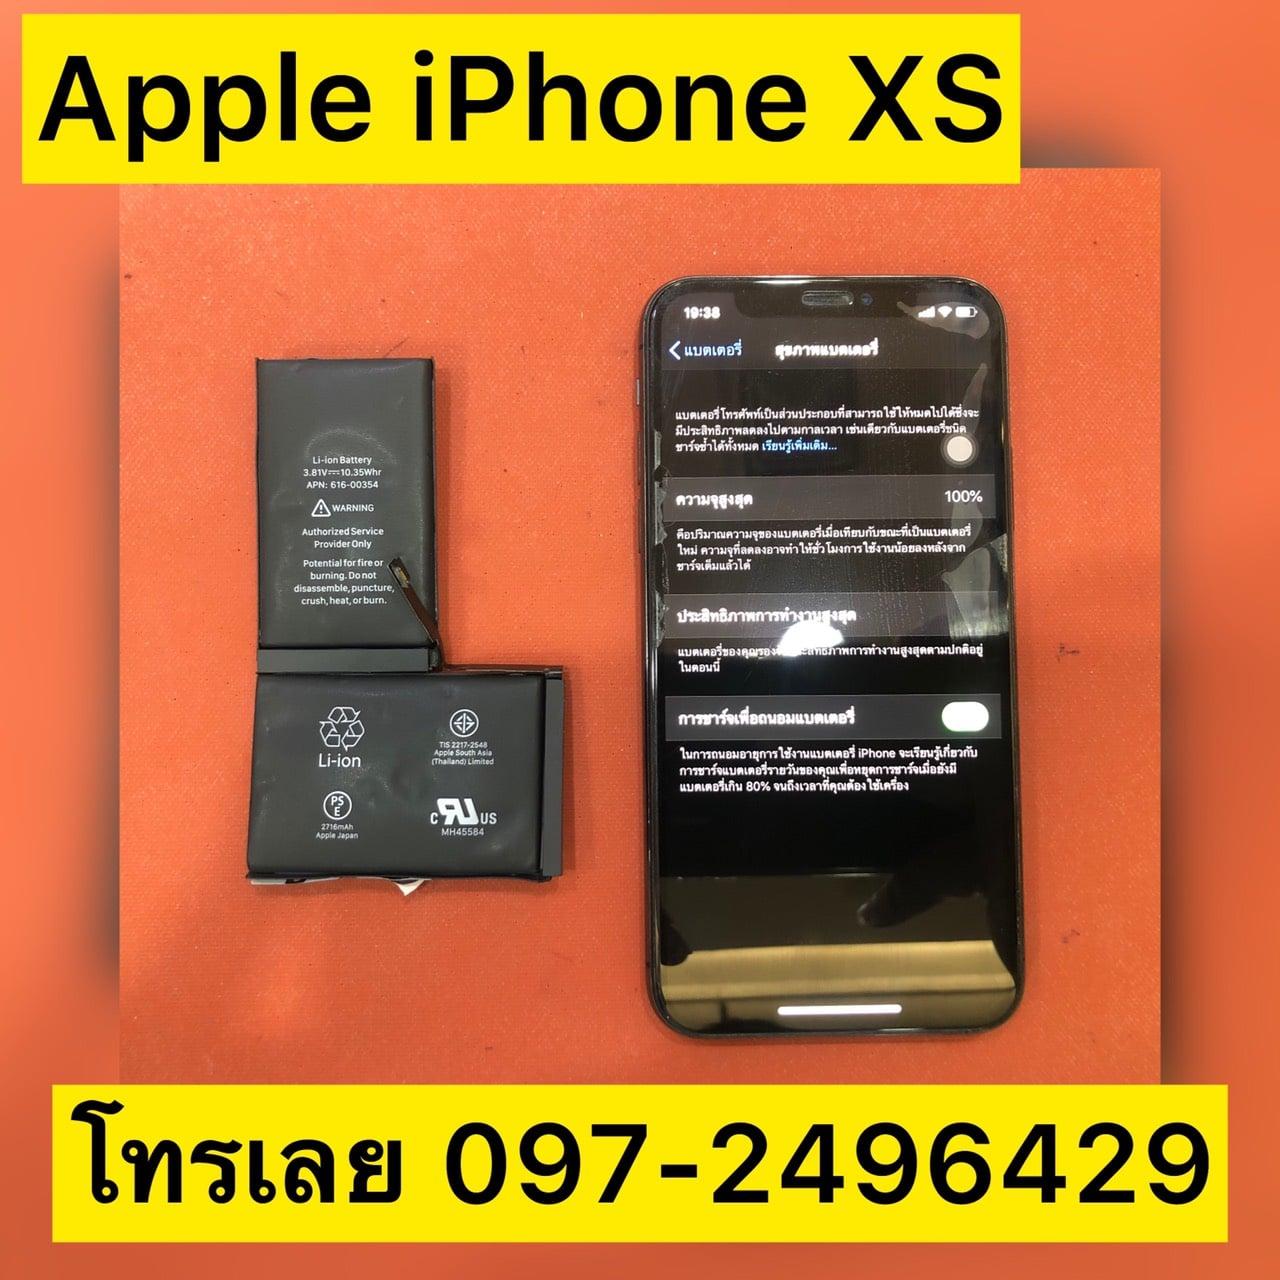 iPhone (ไอโฟน) XS ชาร์จแบตช้า ทำไงดี ส่งซ่อมร้านไหนดี เชื่อถือได้